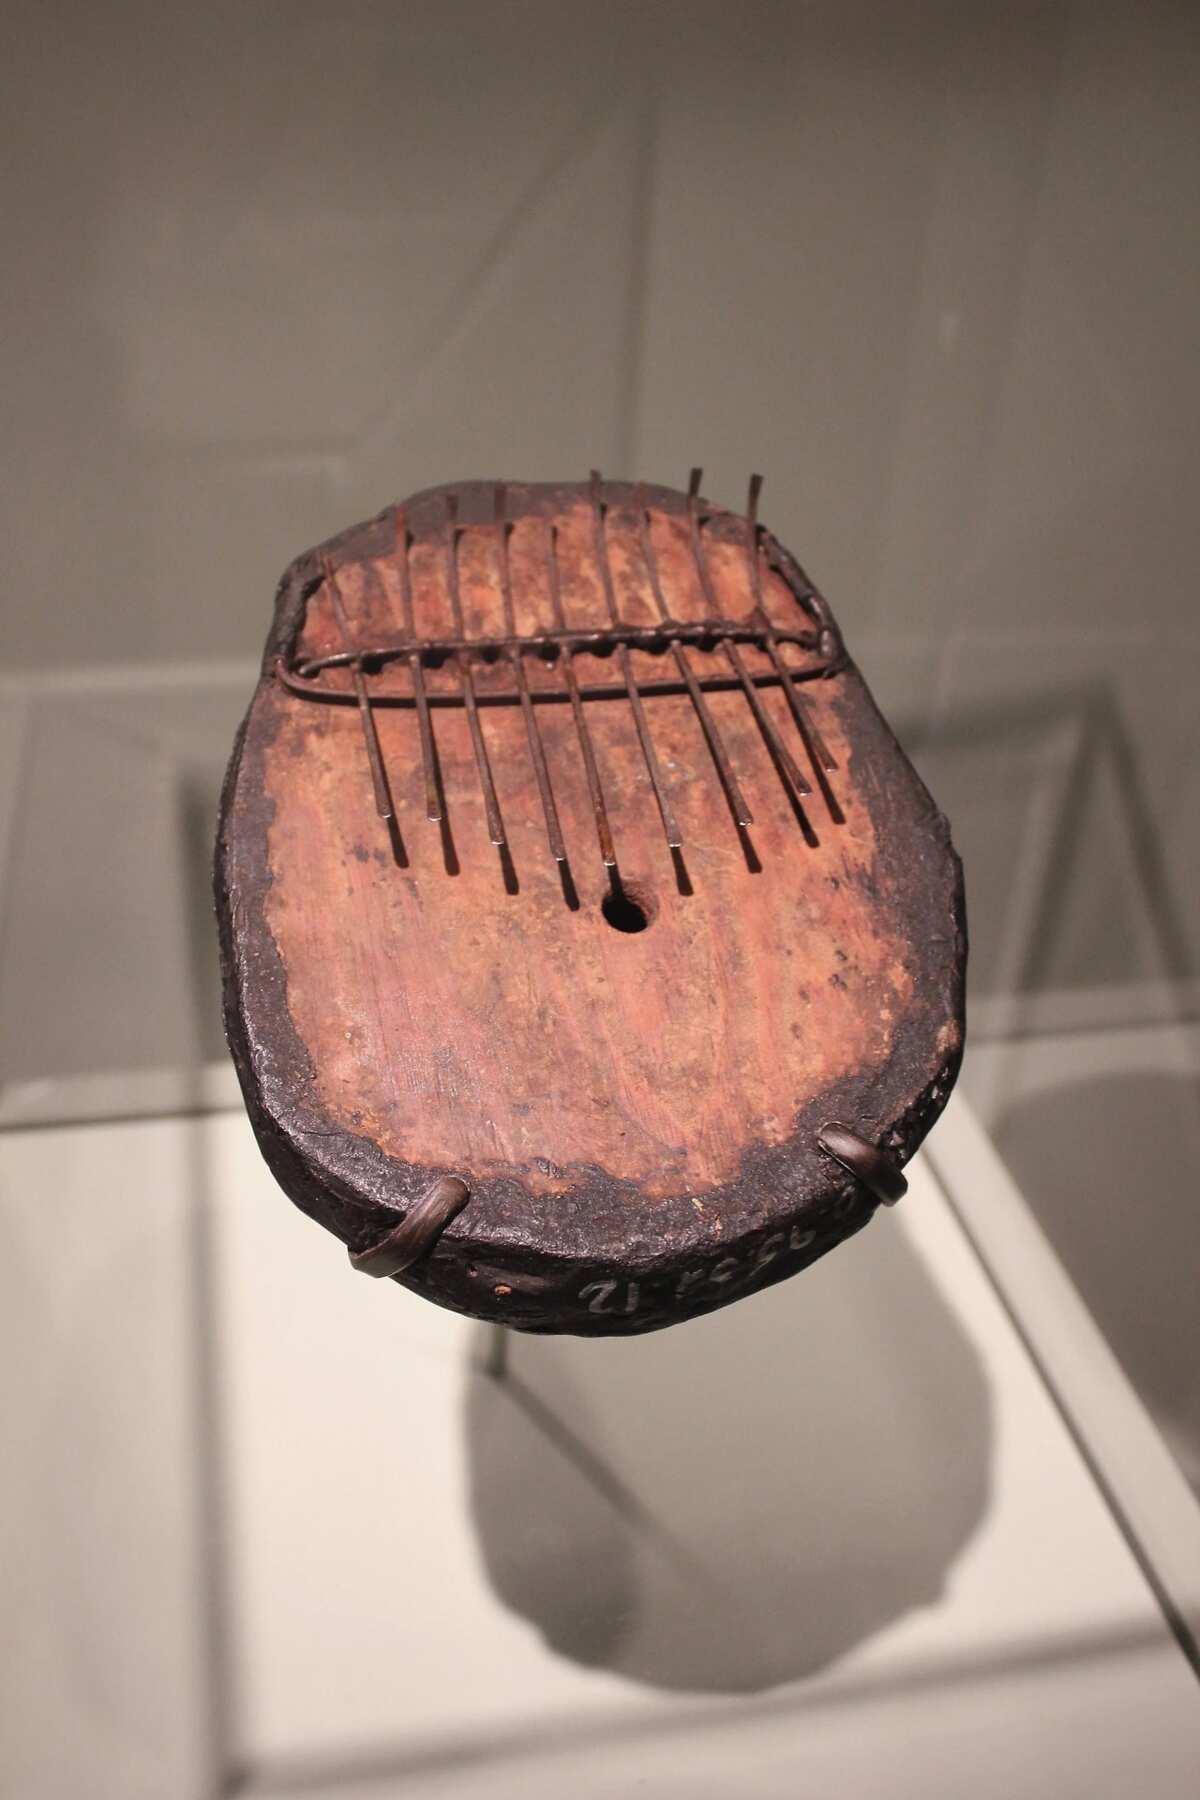 Agidigbo instrument